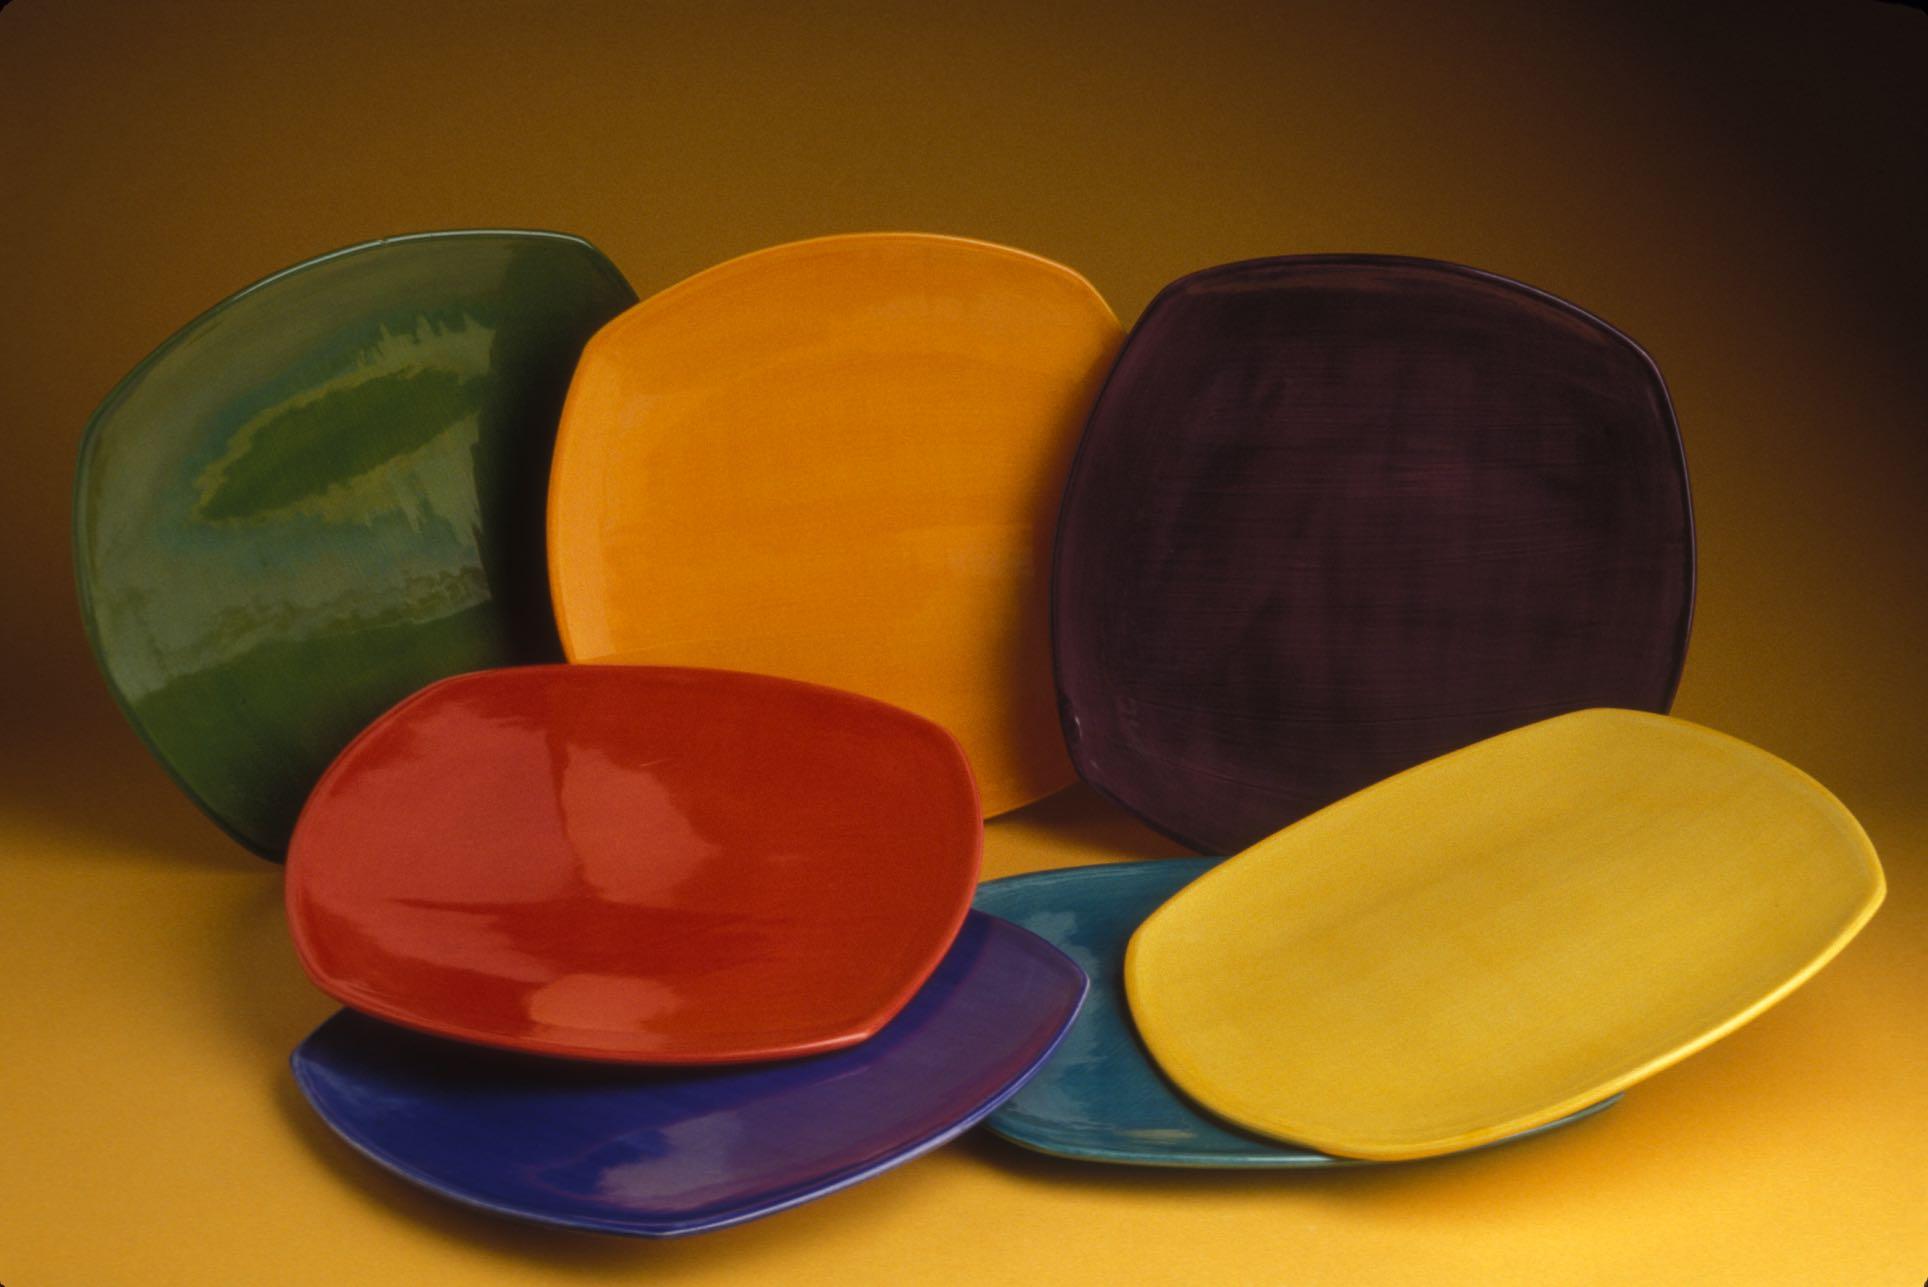 Lunch/Dinner Plate